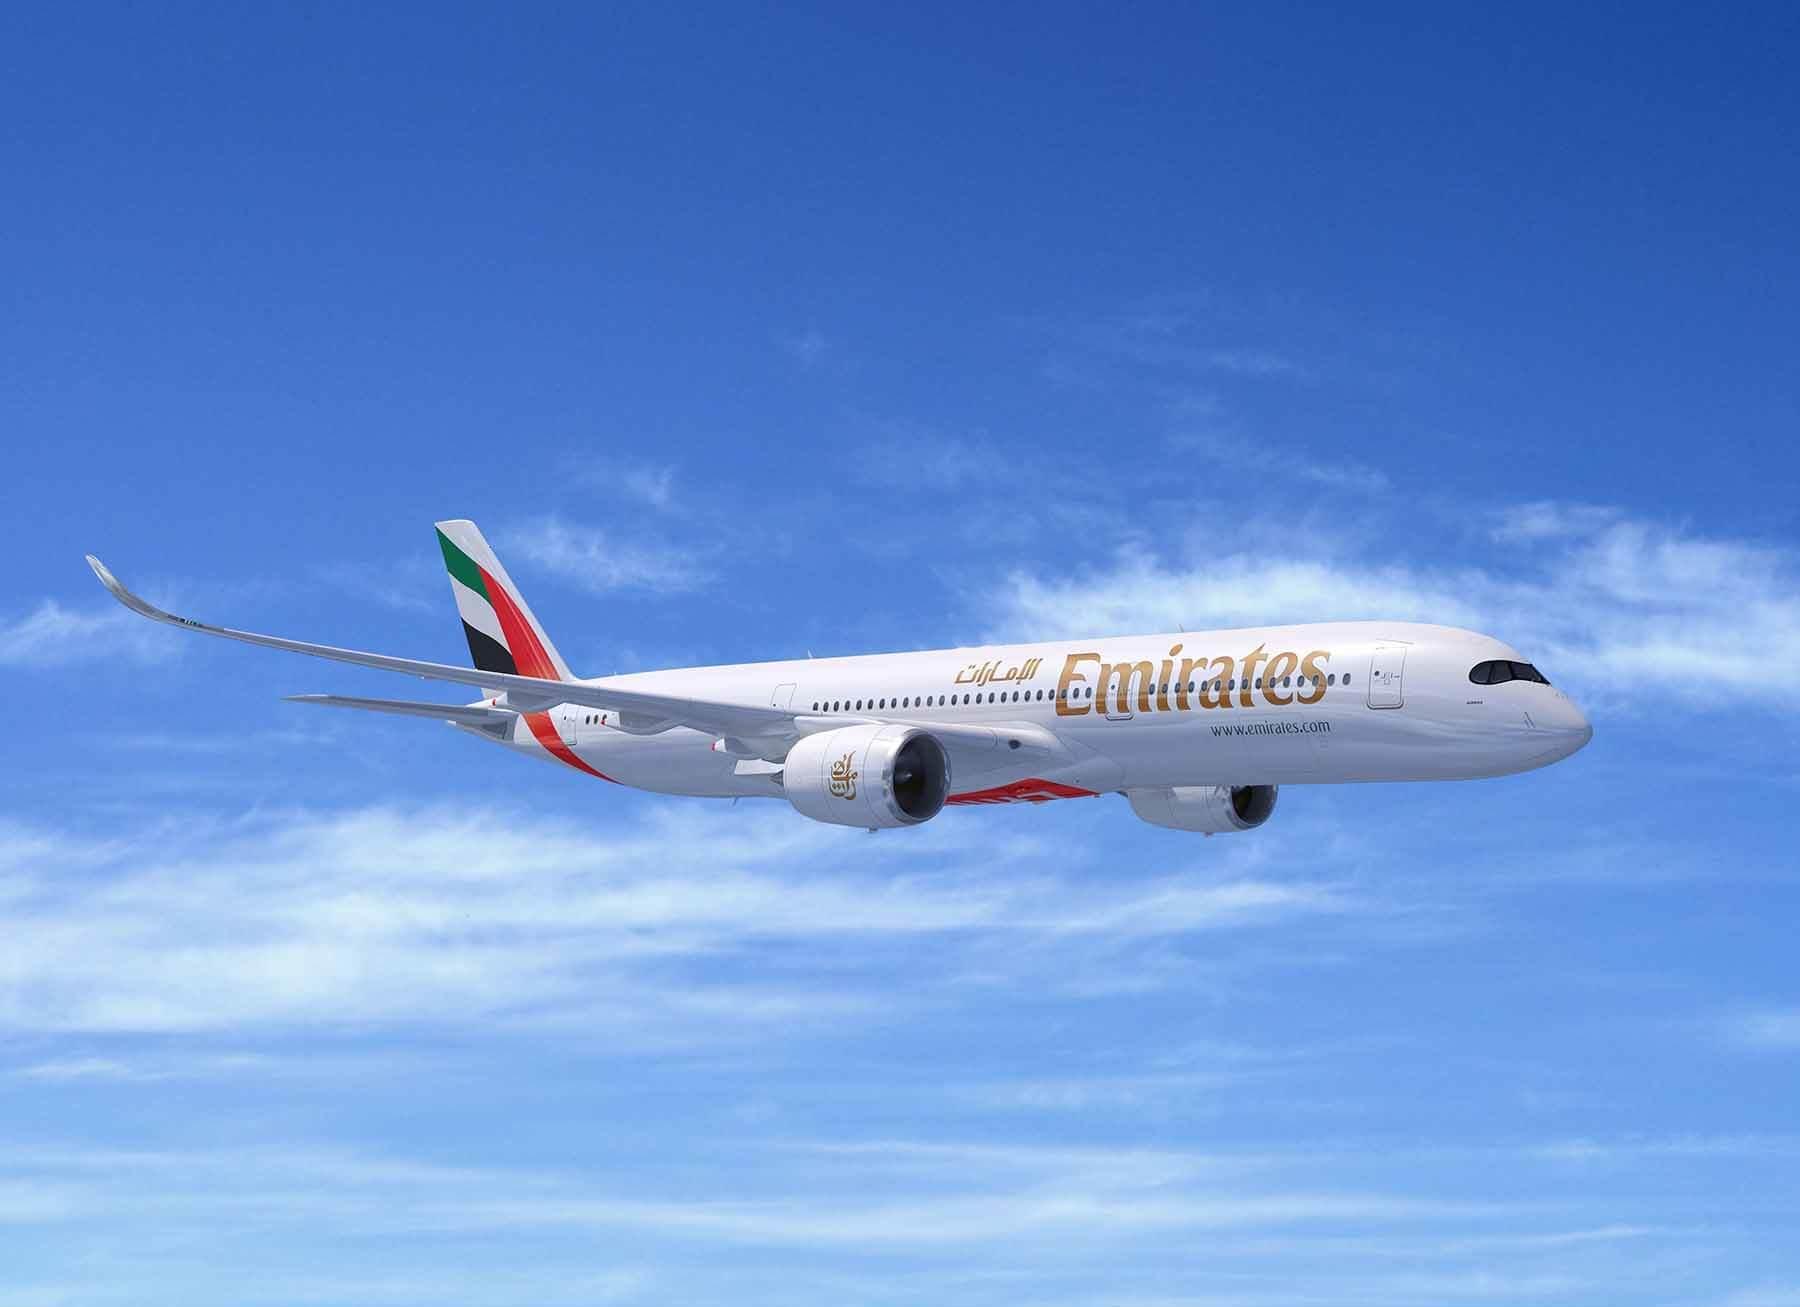 Emirates Airline orders 50 Airbus A350XWB jets at Dubai Airshow 2019